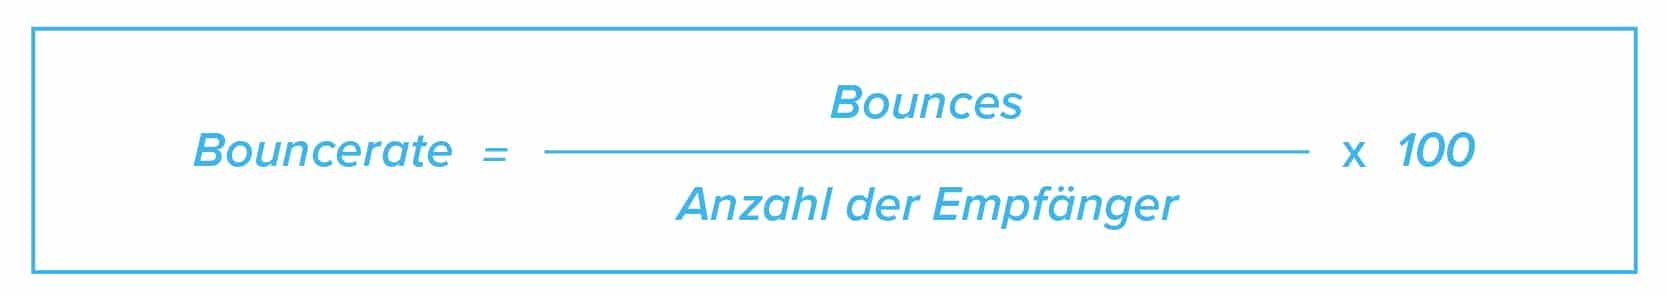 E-Mail Marketing KPIs Formel Bouncerate